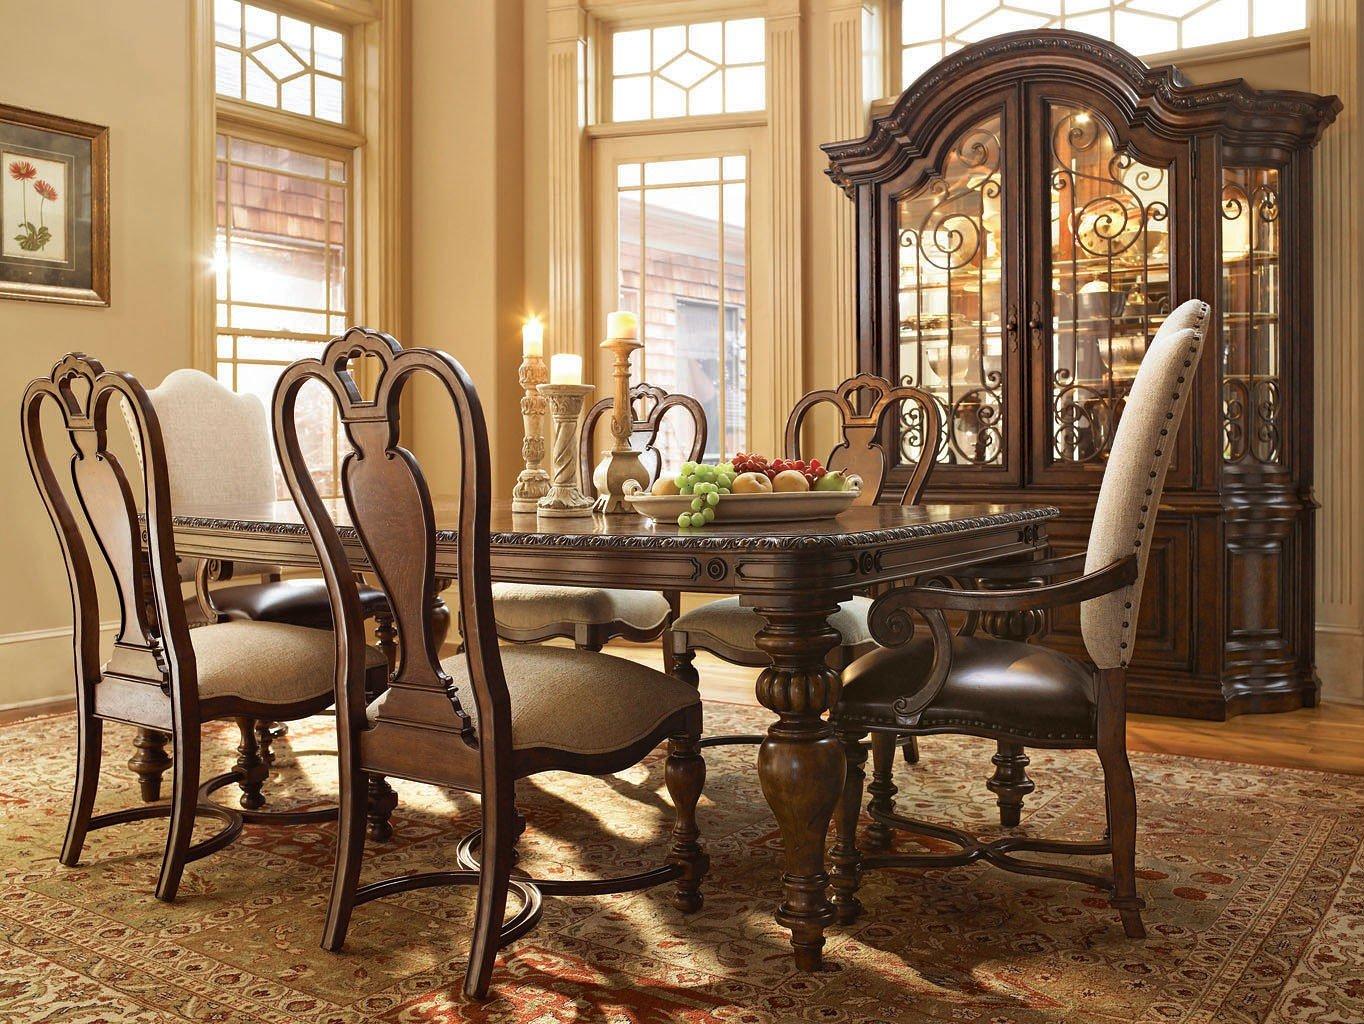 Bolero Dining Room Set W Chair Choices Universal Furniture Furniture Cart